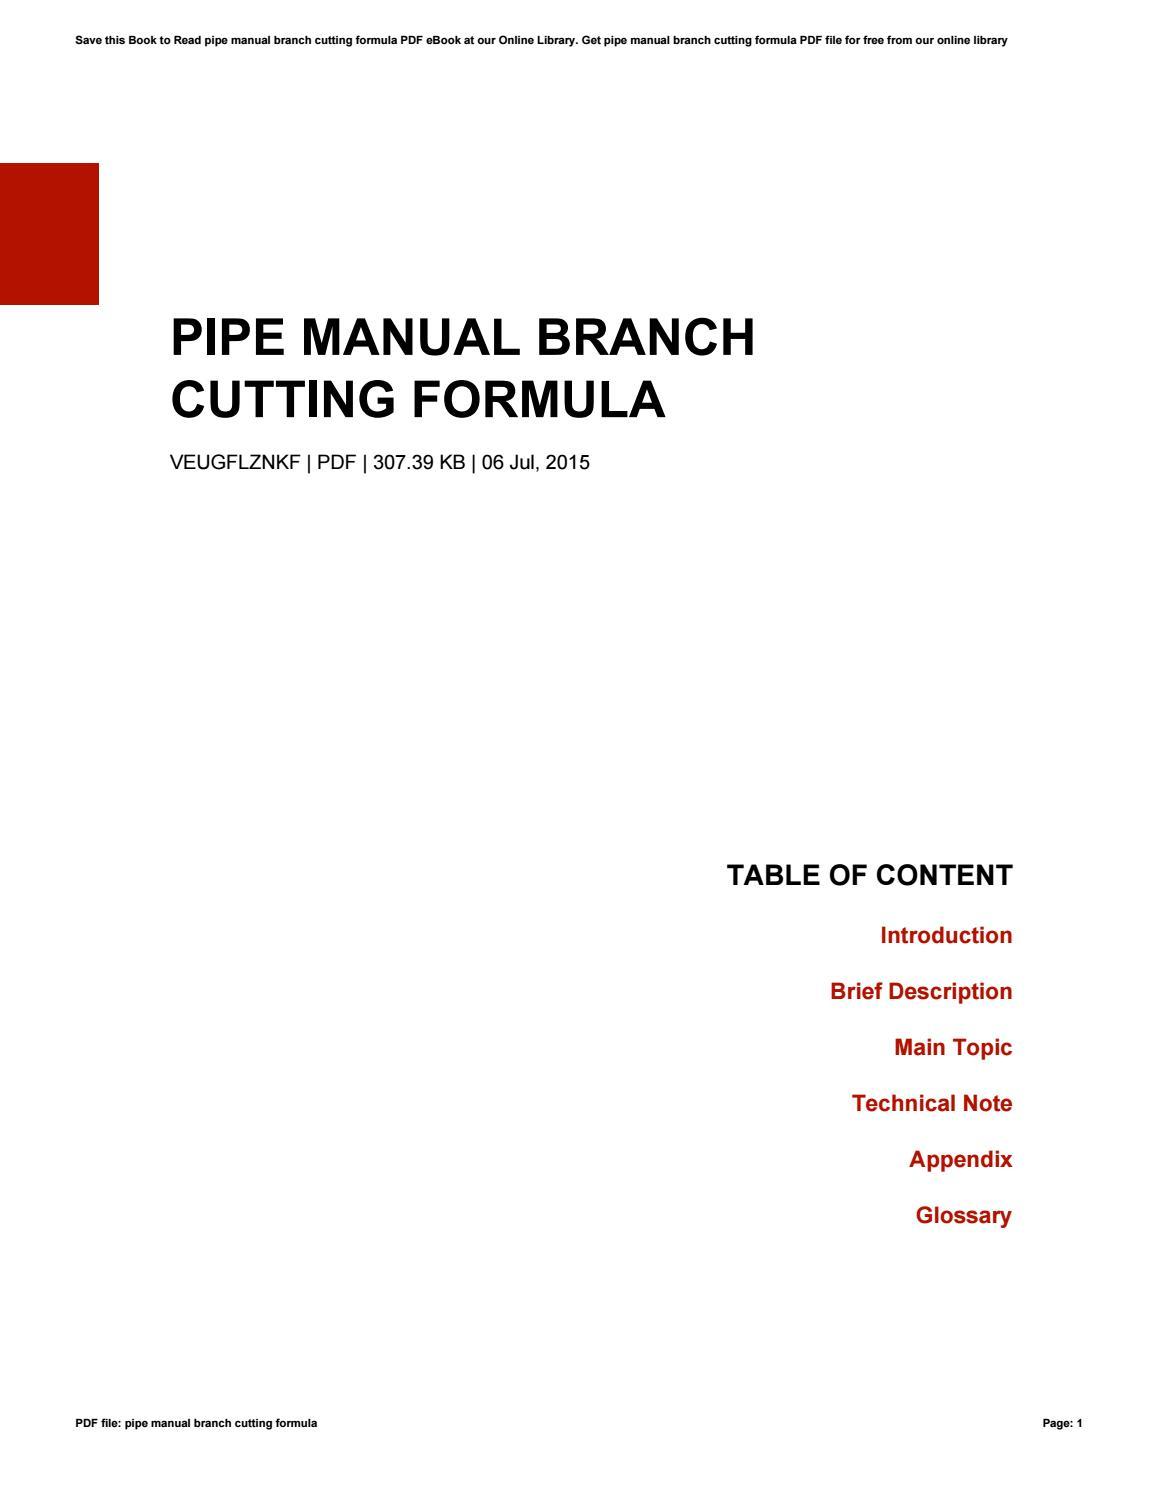 Pipe manual branch cutting formula by JamesHarris3230 - issuu